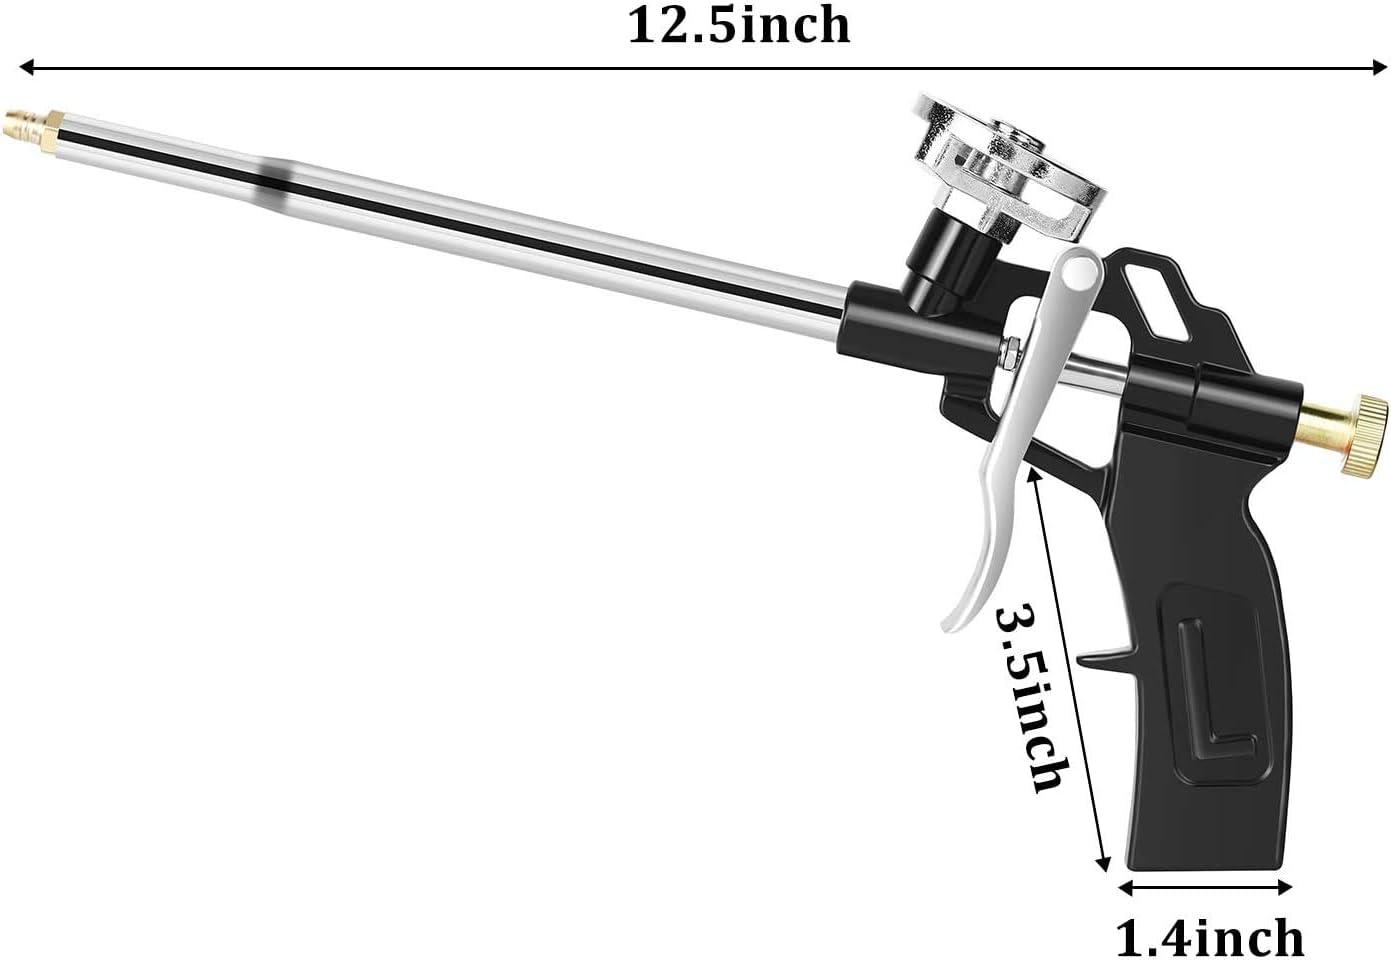 Pistola de espuma de poliuretano profesional de calidad montaje Pistola Dise/ño Pistola de espuma